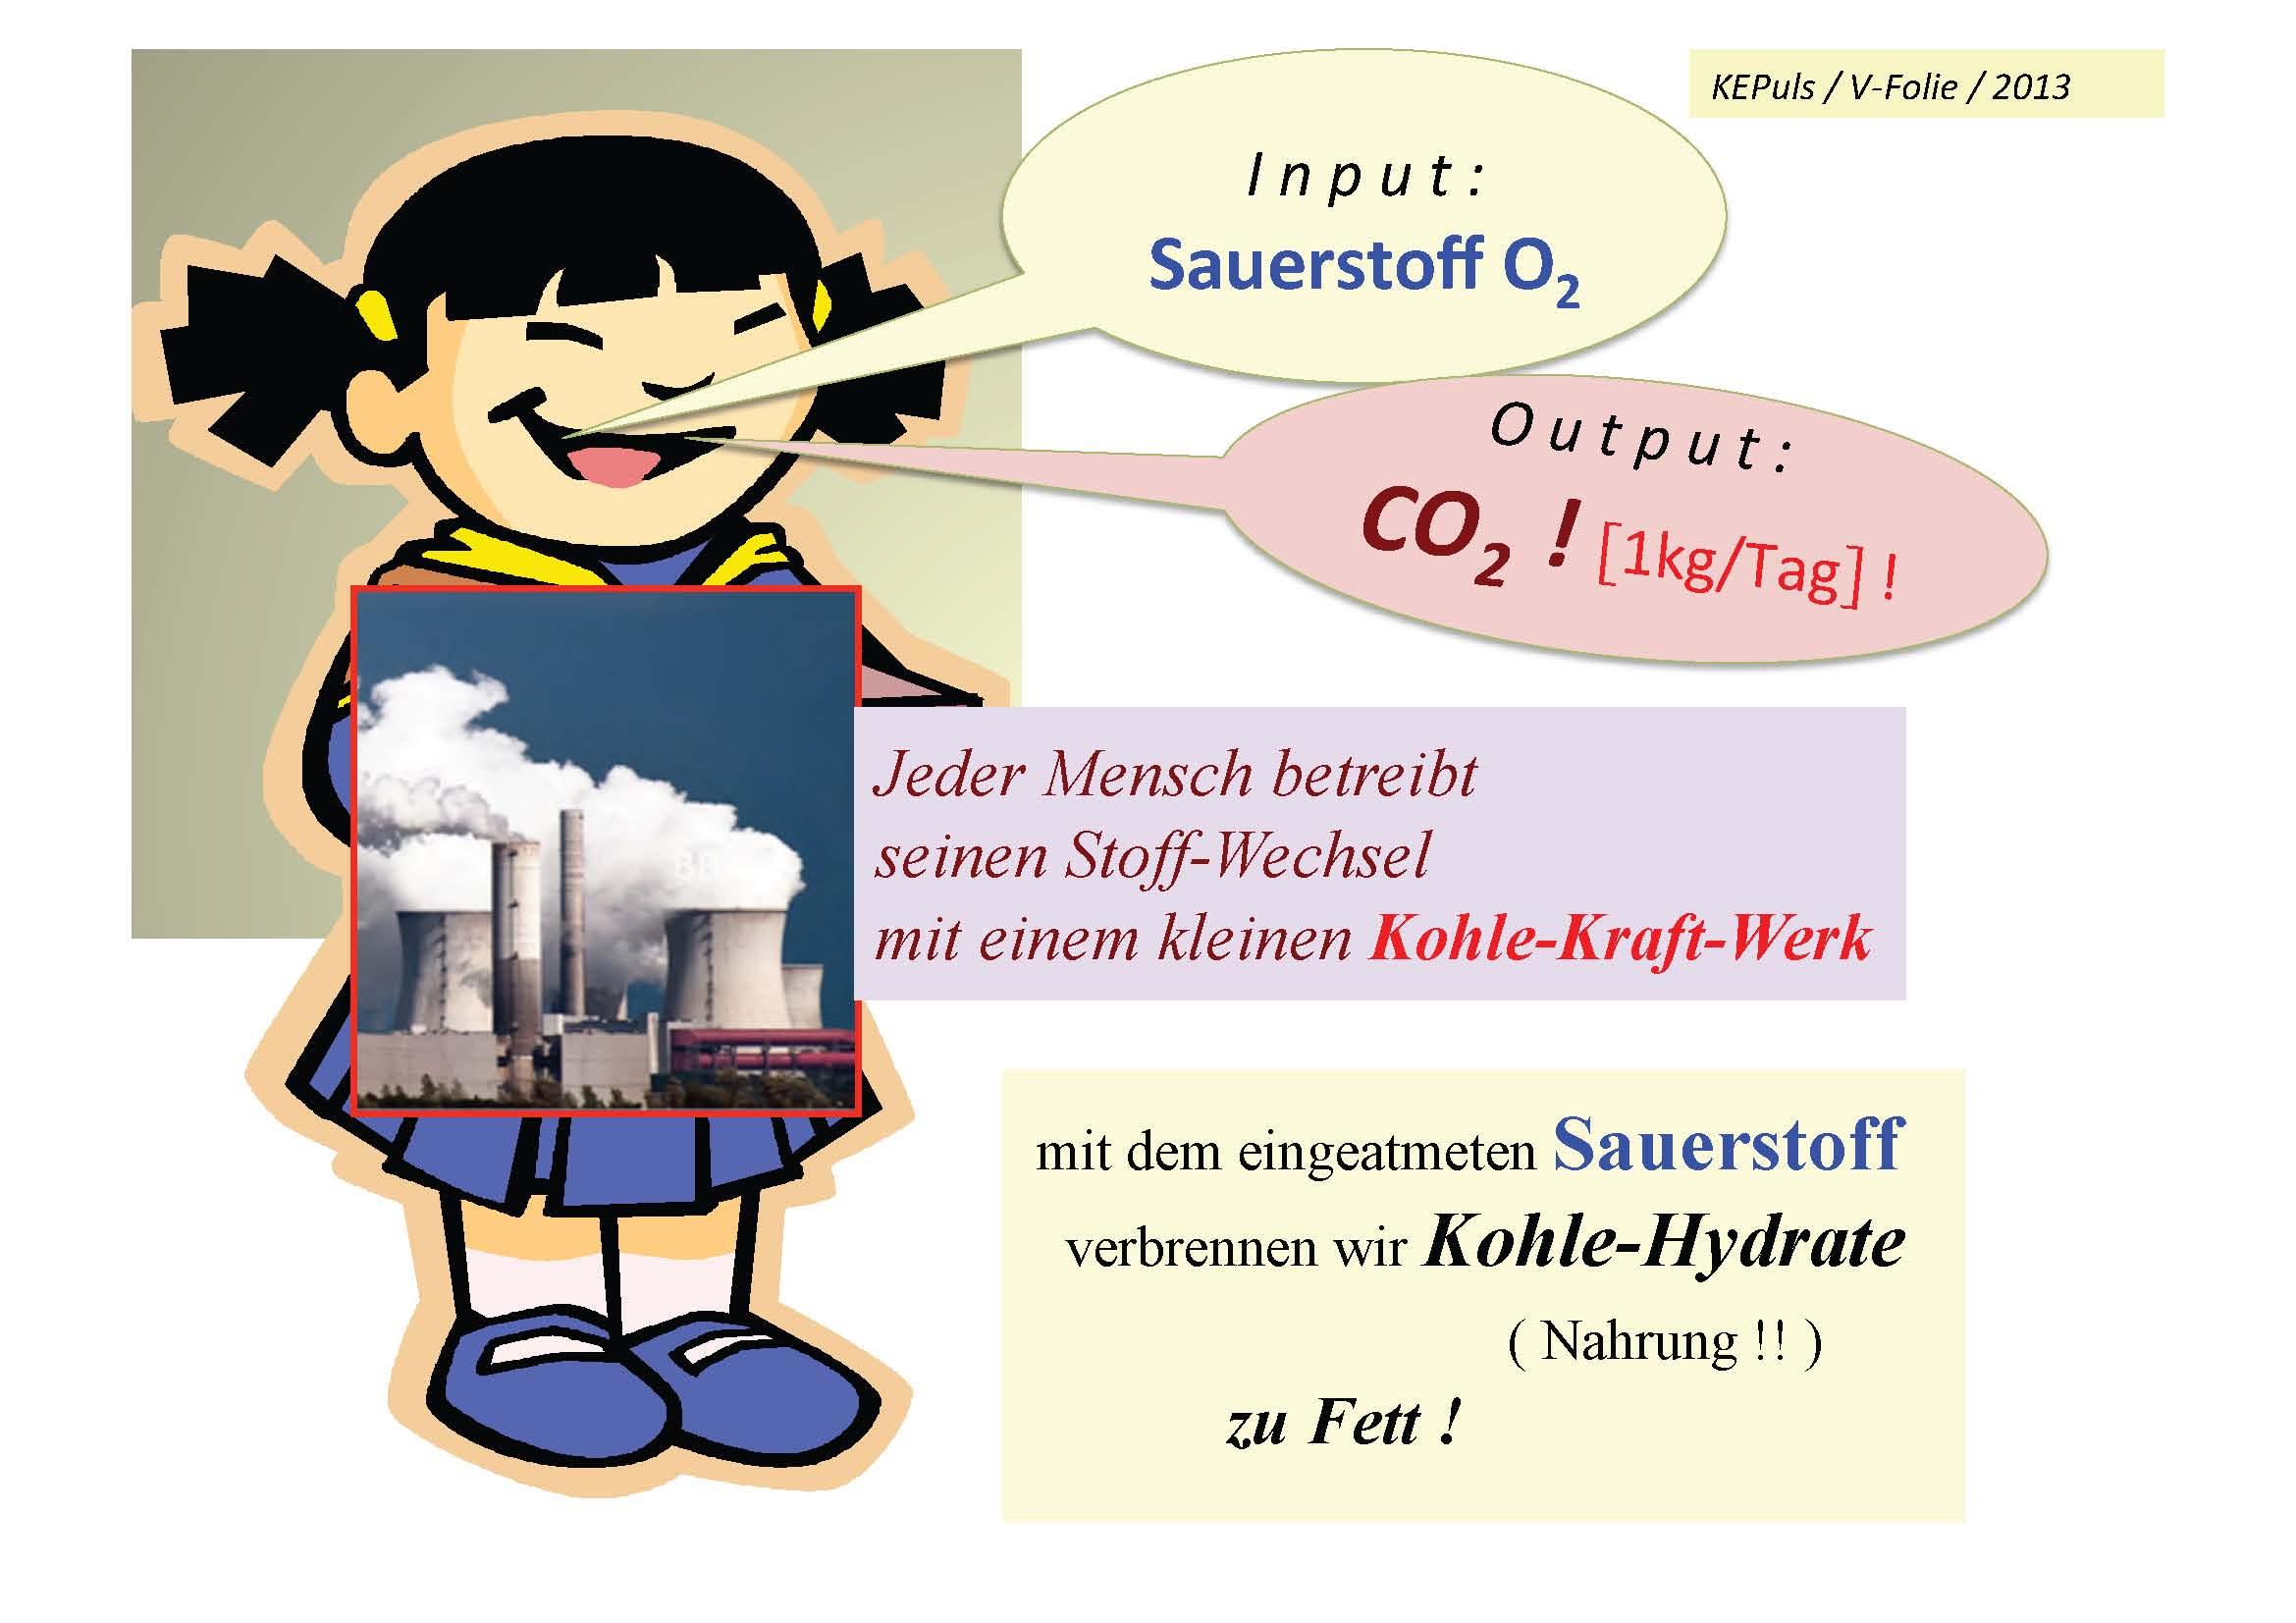 http://www.eike-klima-energie.eu/http://www.eike-klima-energie.eu/wp-content/uploads/2016/07/CO2_Kraftwerk.jpg